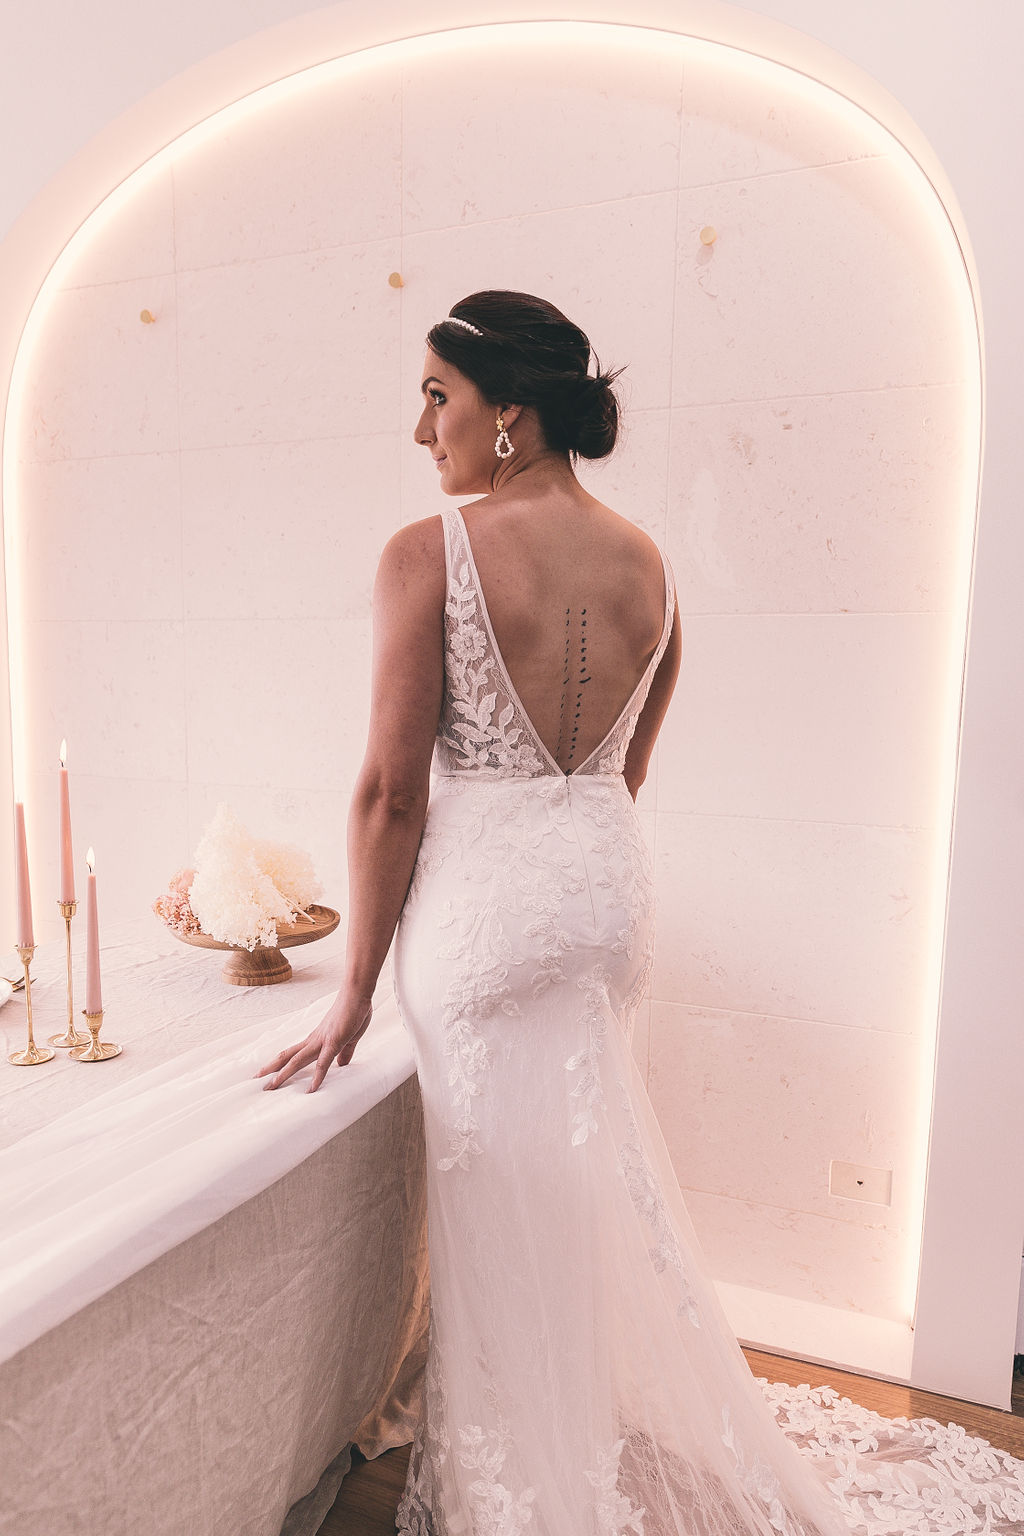 BRIDAL SHOOT: LILY GRACE BRIDAL X BOHO BRIDAL DESIGN | THE ENTRANCE NSW